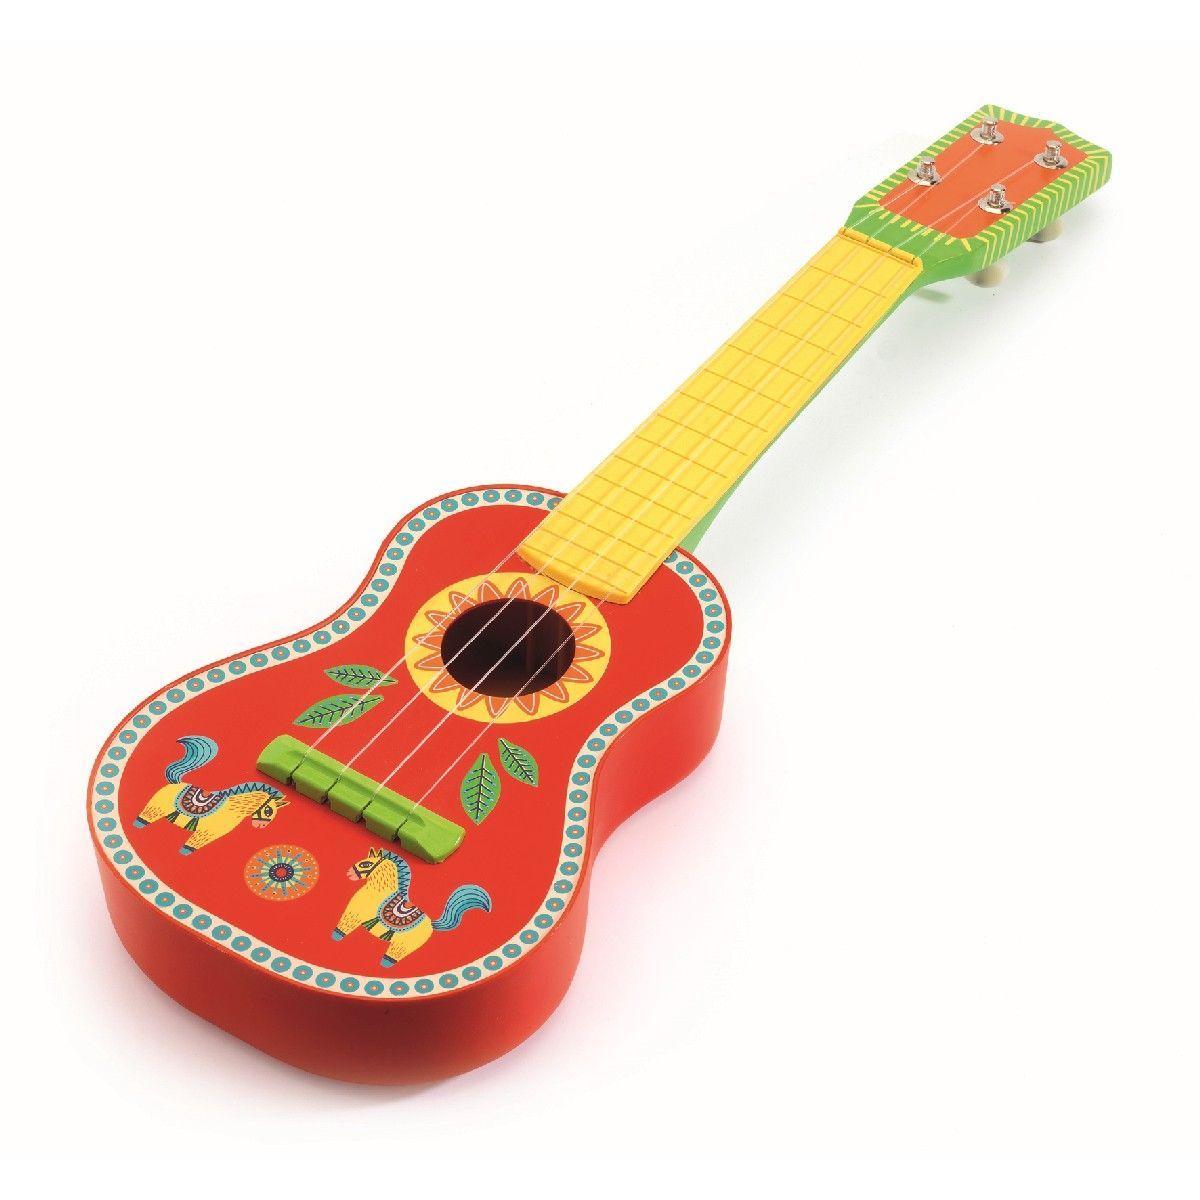 djeco anibambo ukulele in rot mit print 53 cm  gitarre